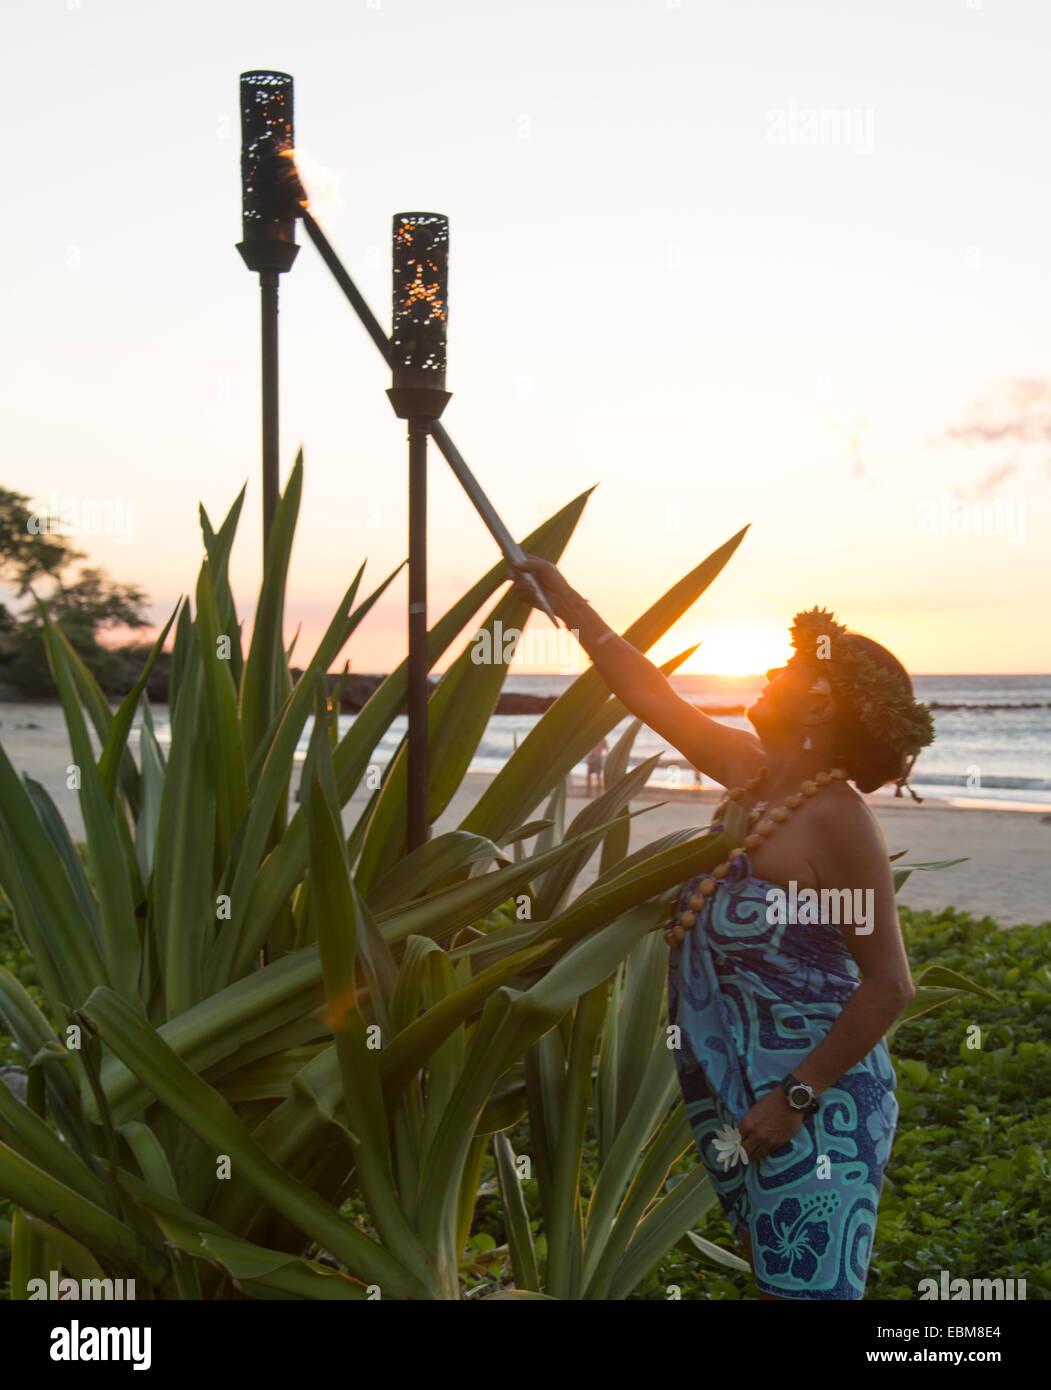 Femme en robe hawaïenne torche tiki des feux sur la plage au coucher du soleil Big Island Hawaii USA Photo Stock